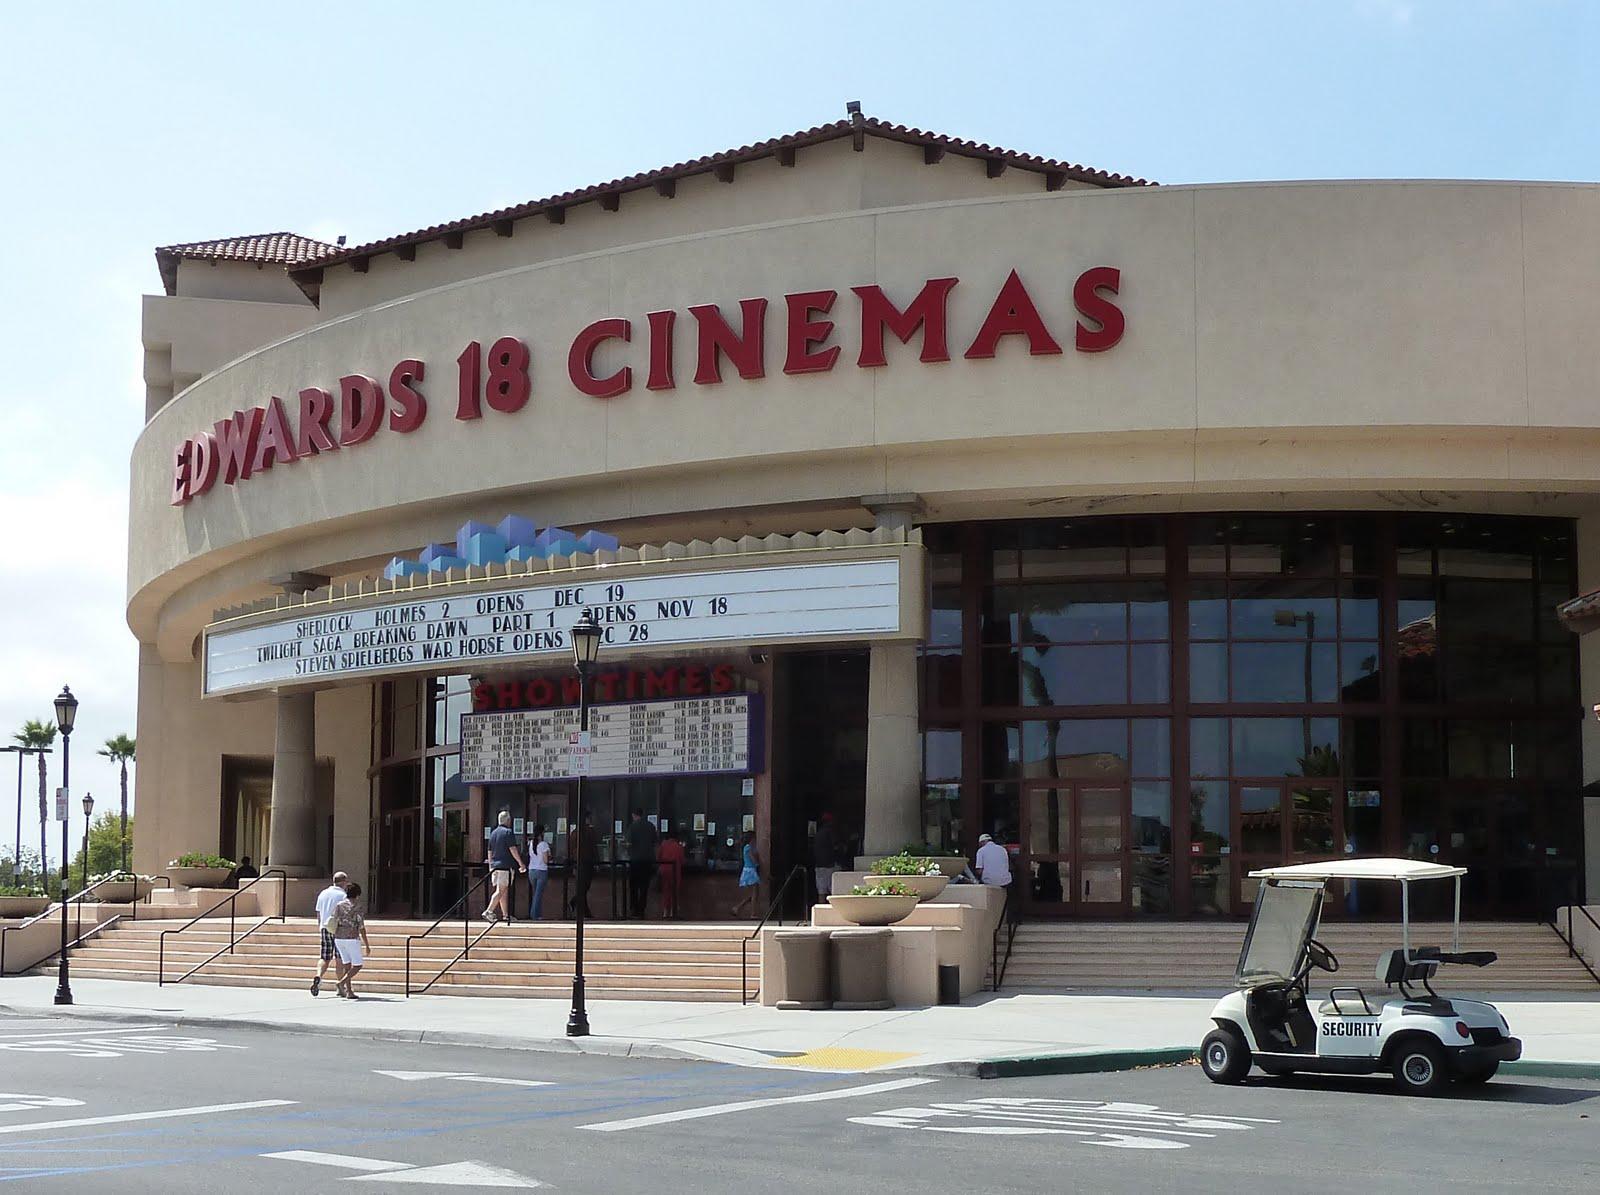 Dec 09, · Find Edwards San Marcos Stadium 18 info, movie times for Sunday Dec 09 buy Edwards San Marcos Stadium 18 movie tickets. San Marcos CA Untitled Disney Animation (11/27/)|How the Grinch Stole Christmas|The Nutcracker.